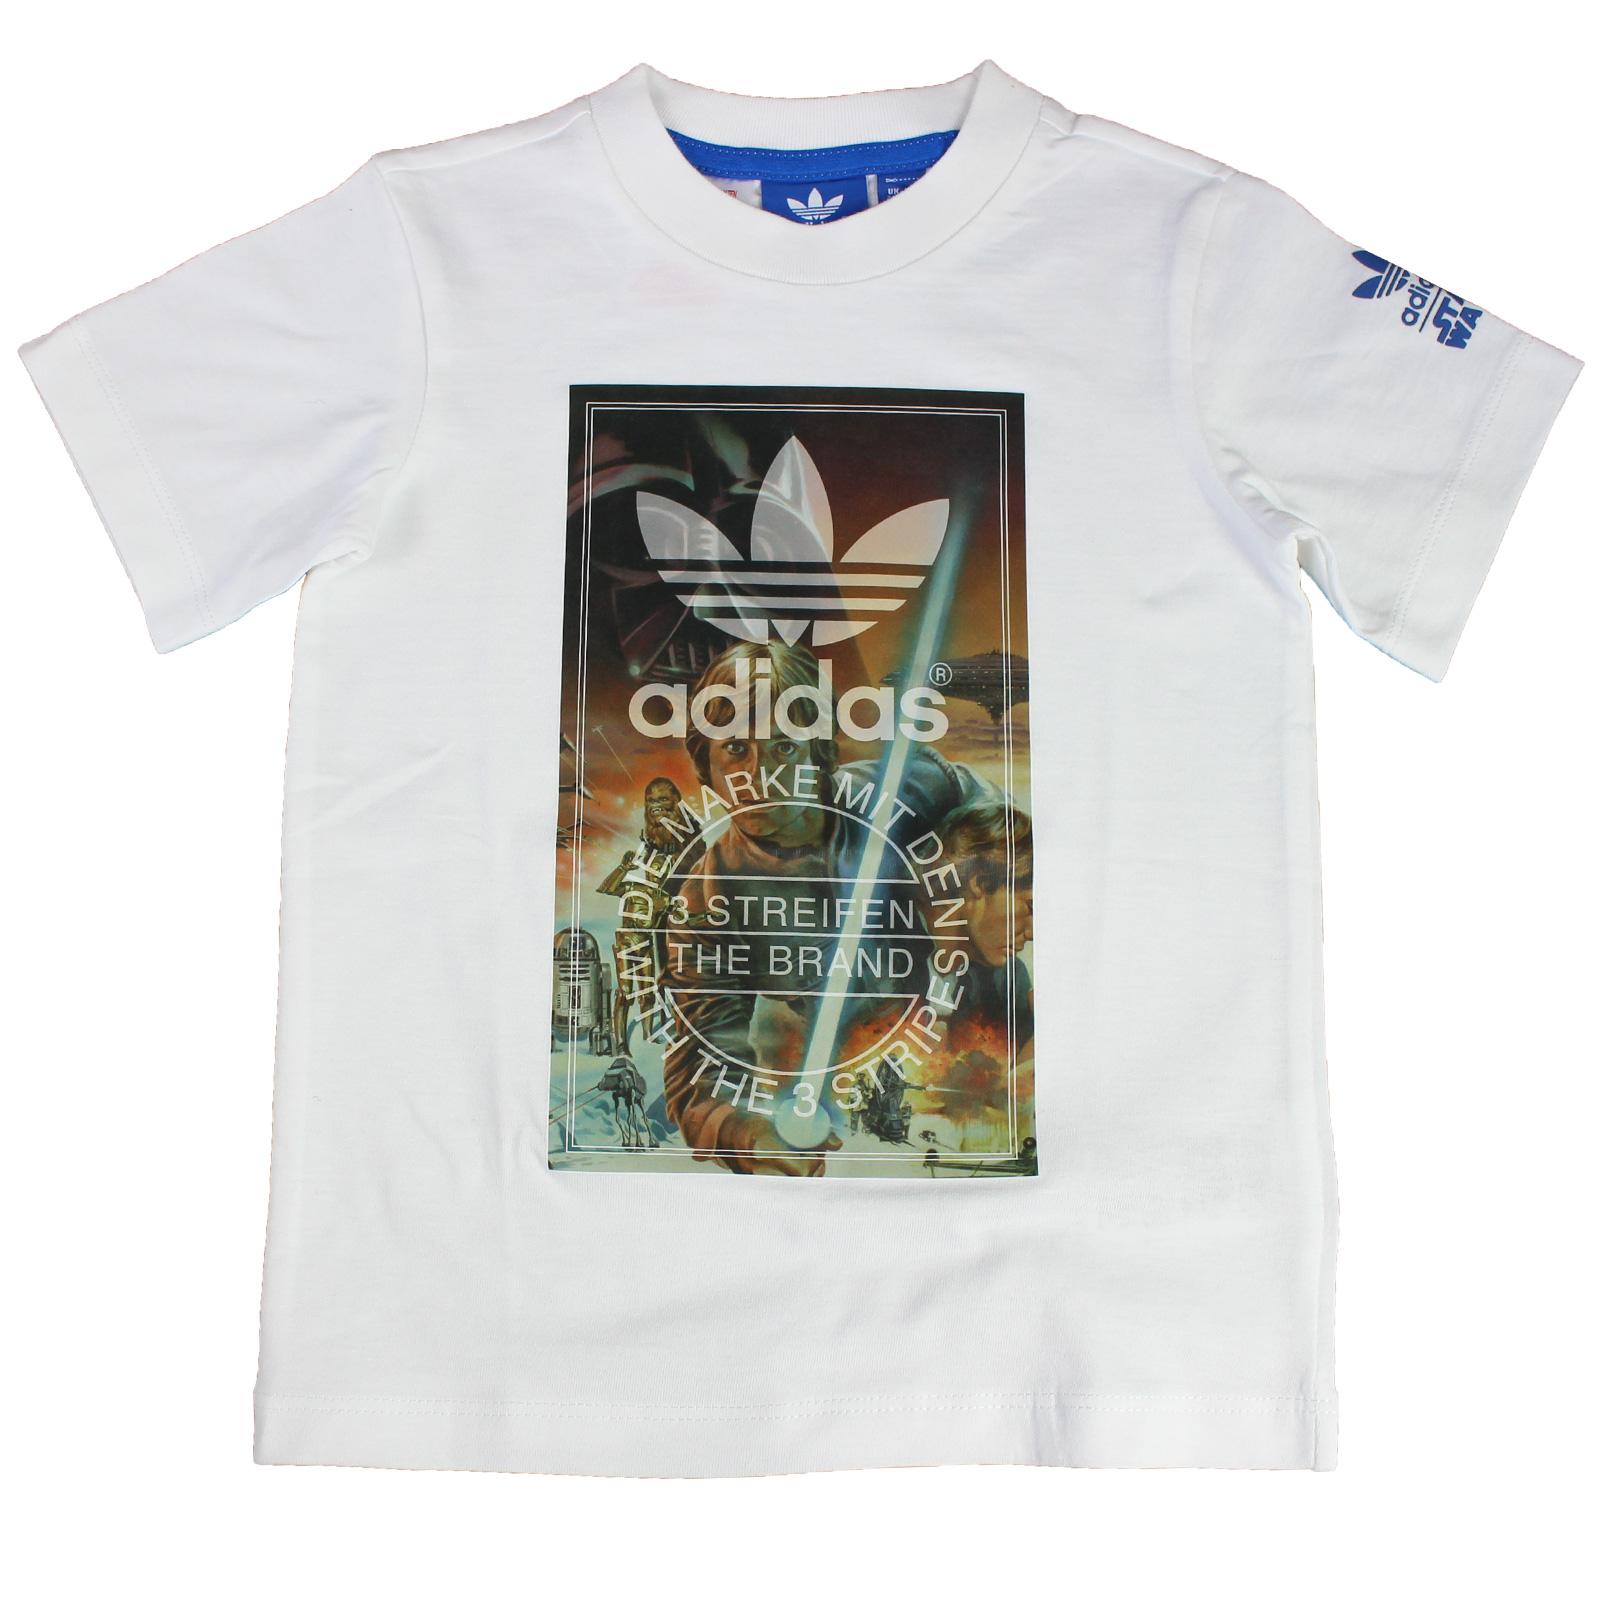 adidas Originals Star Wars Archive Tee Luke Skywalker R2D2 Han Solo Kinder Shirt